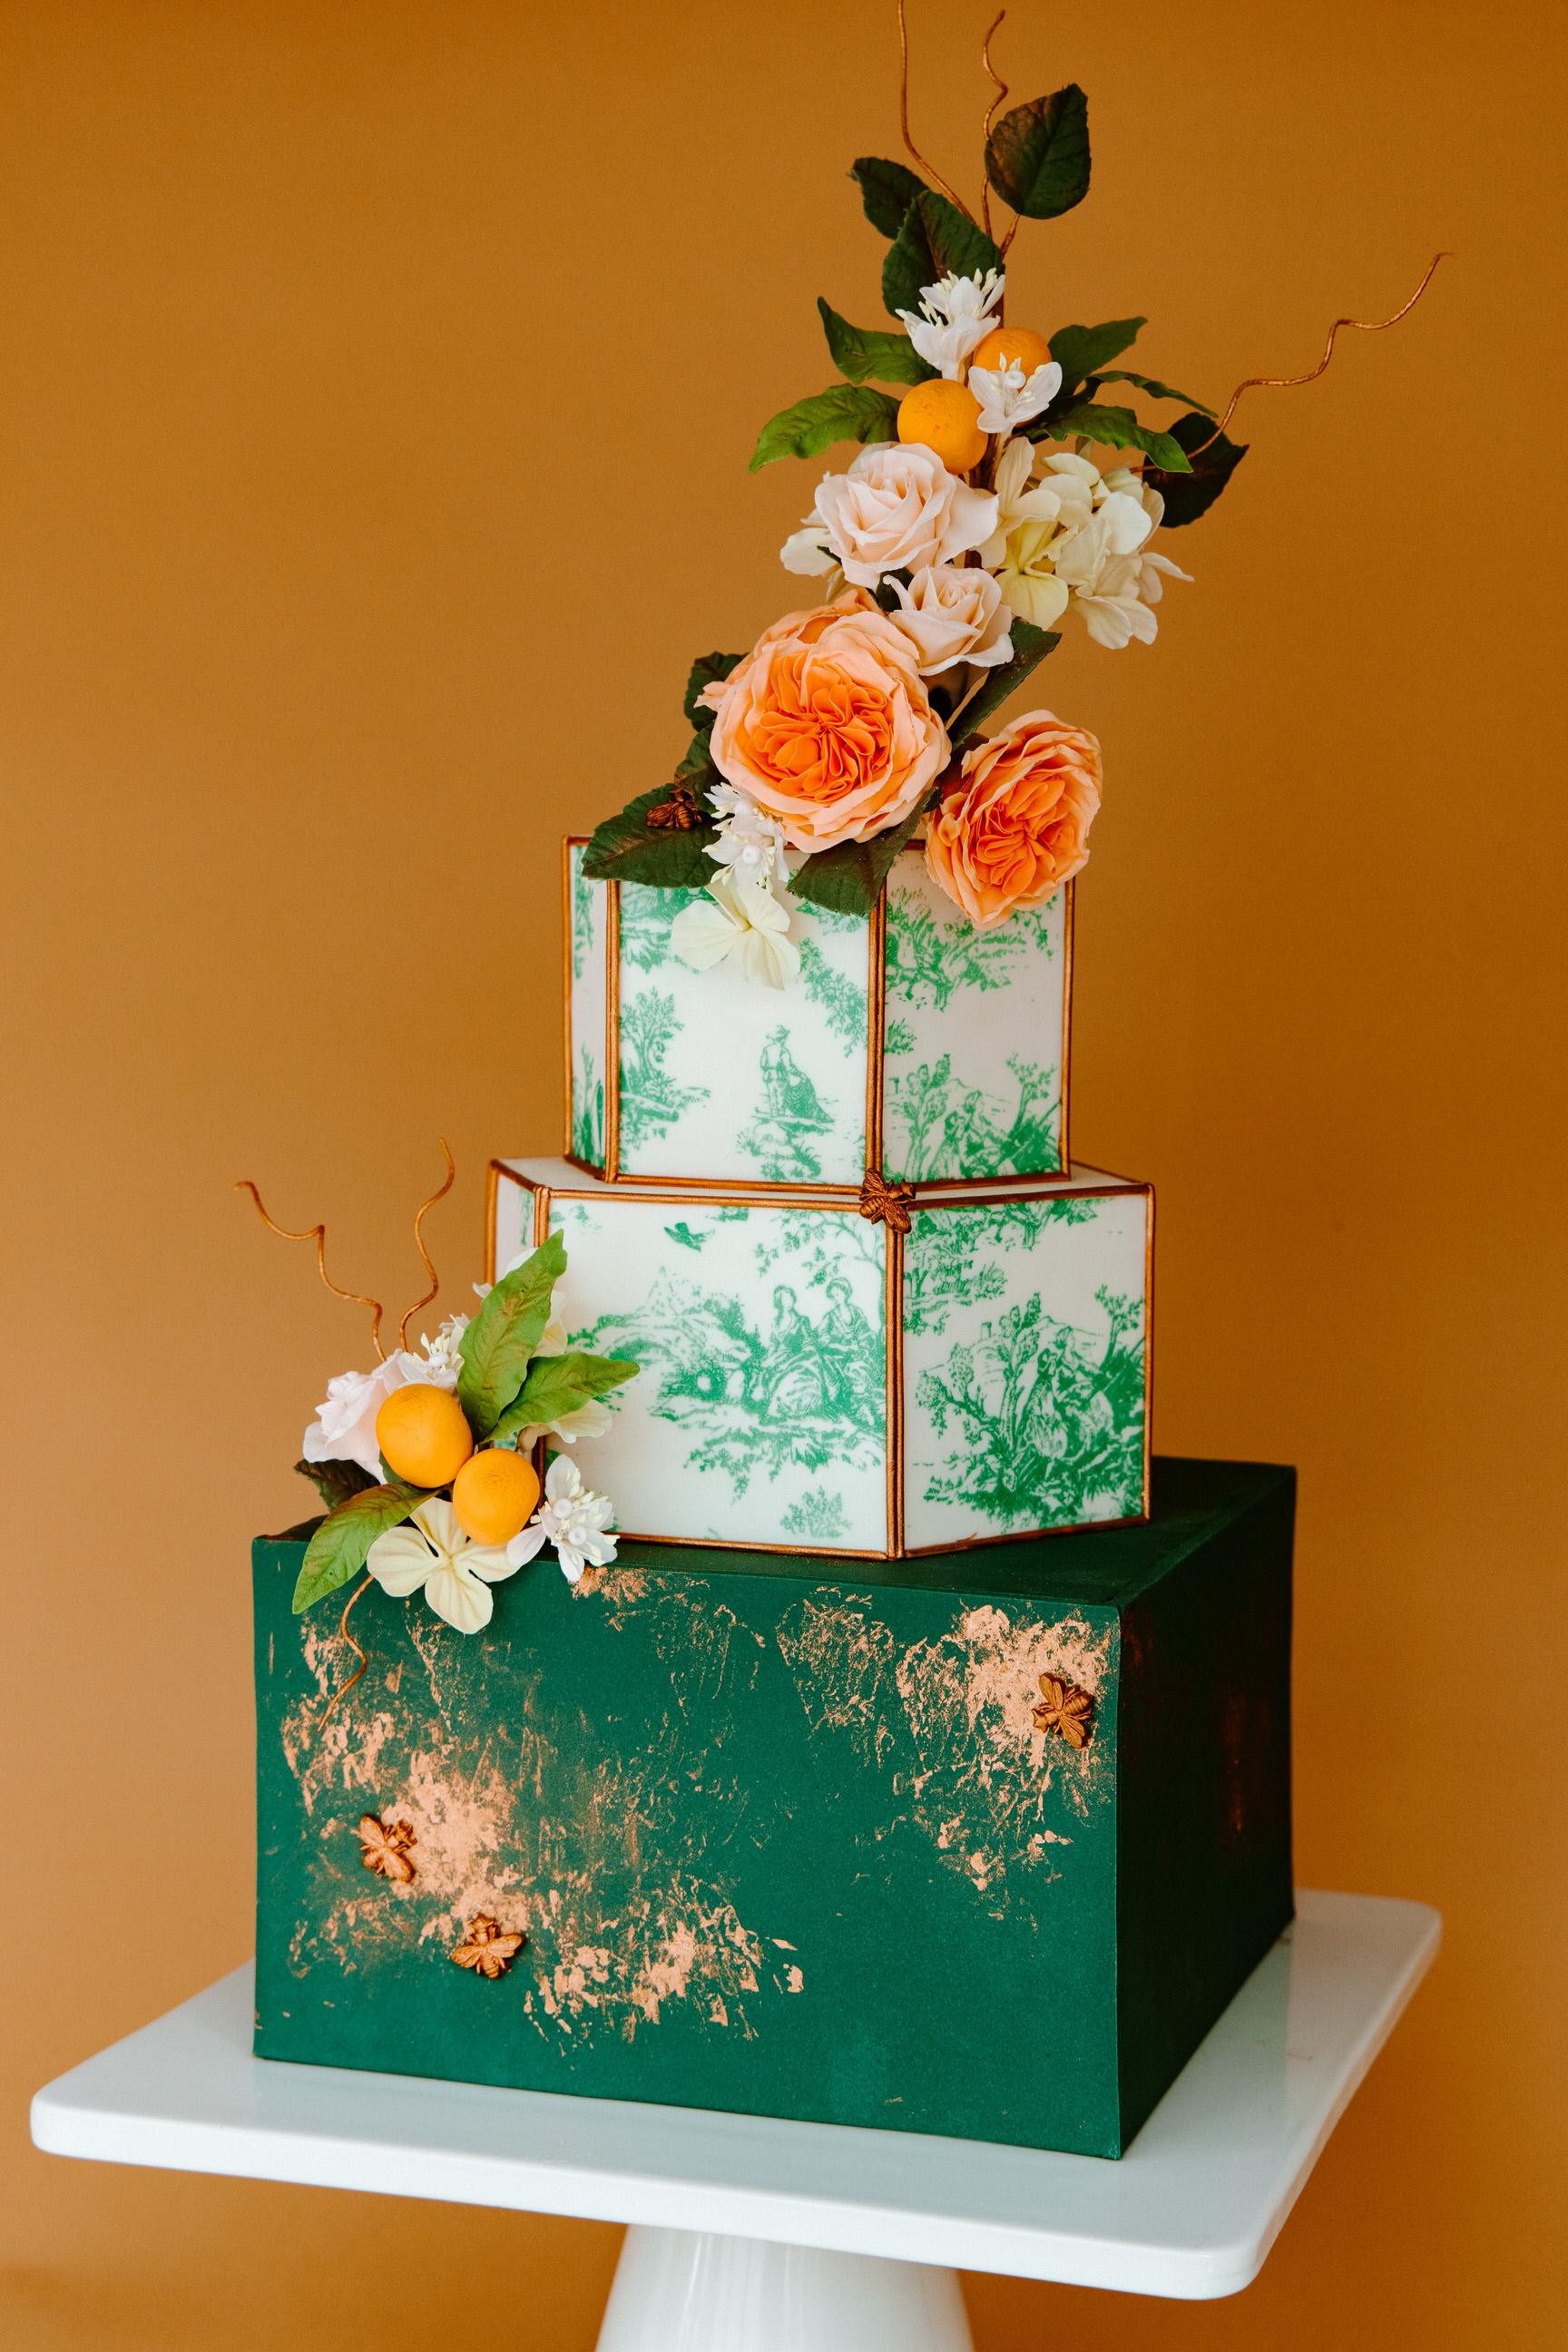 gateaux-cake-7444.jpg